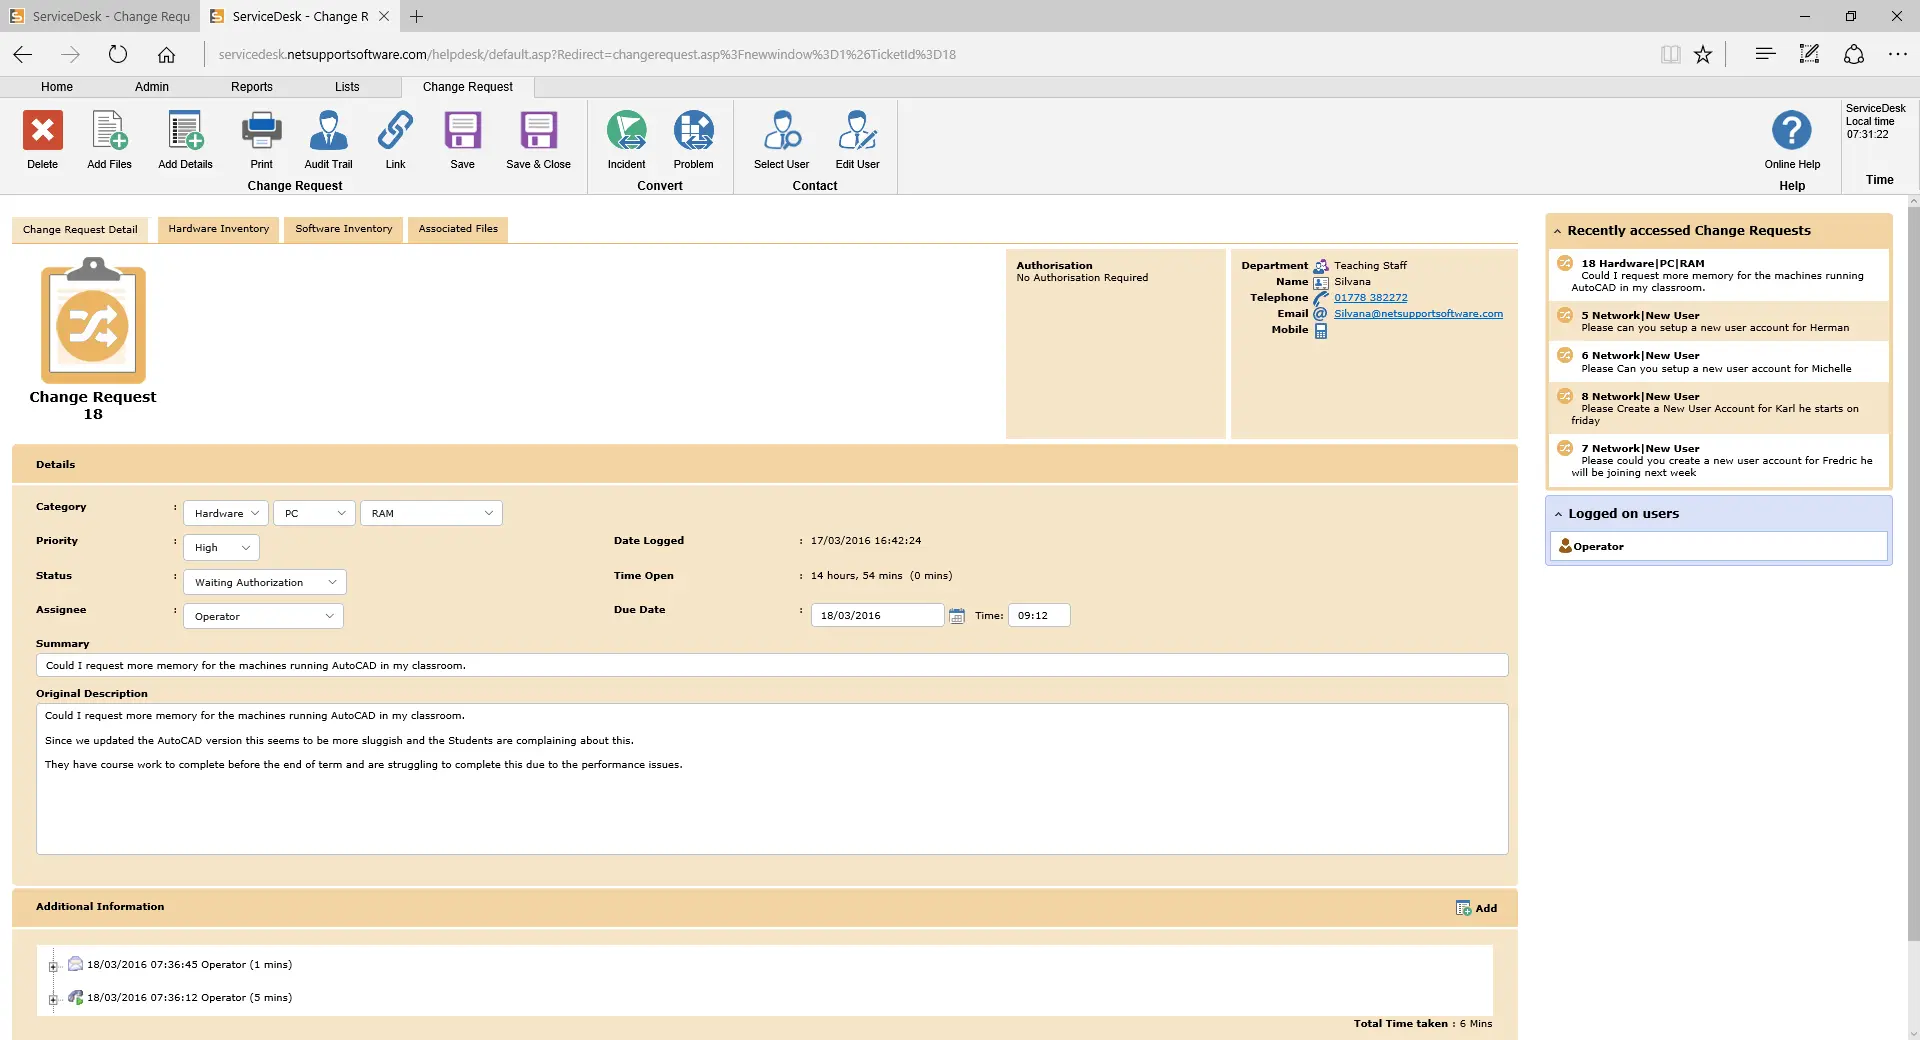 NetSupport ServiceDesk change management